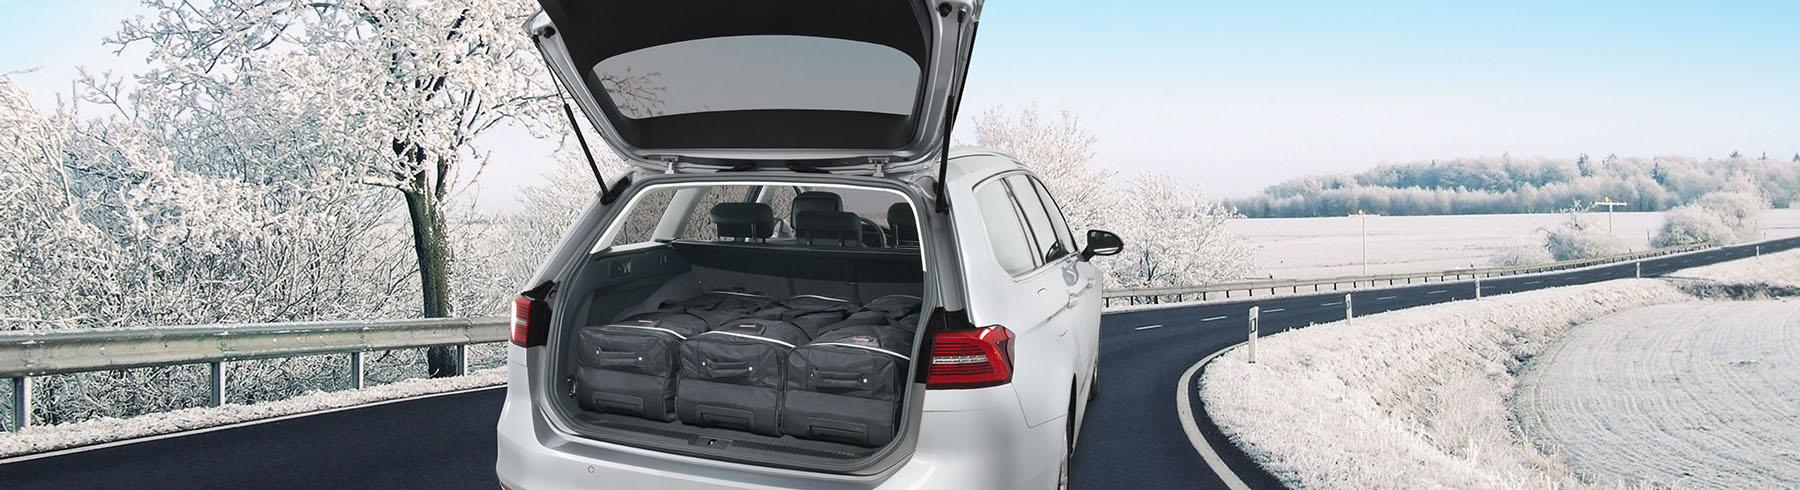 car-bags-concept-winter-01